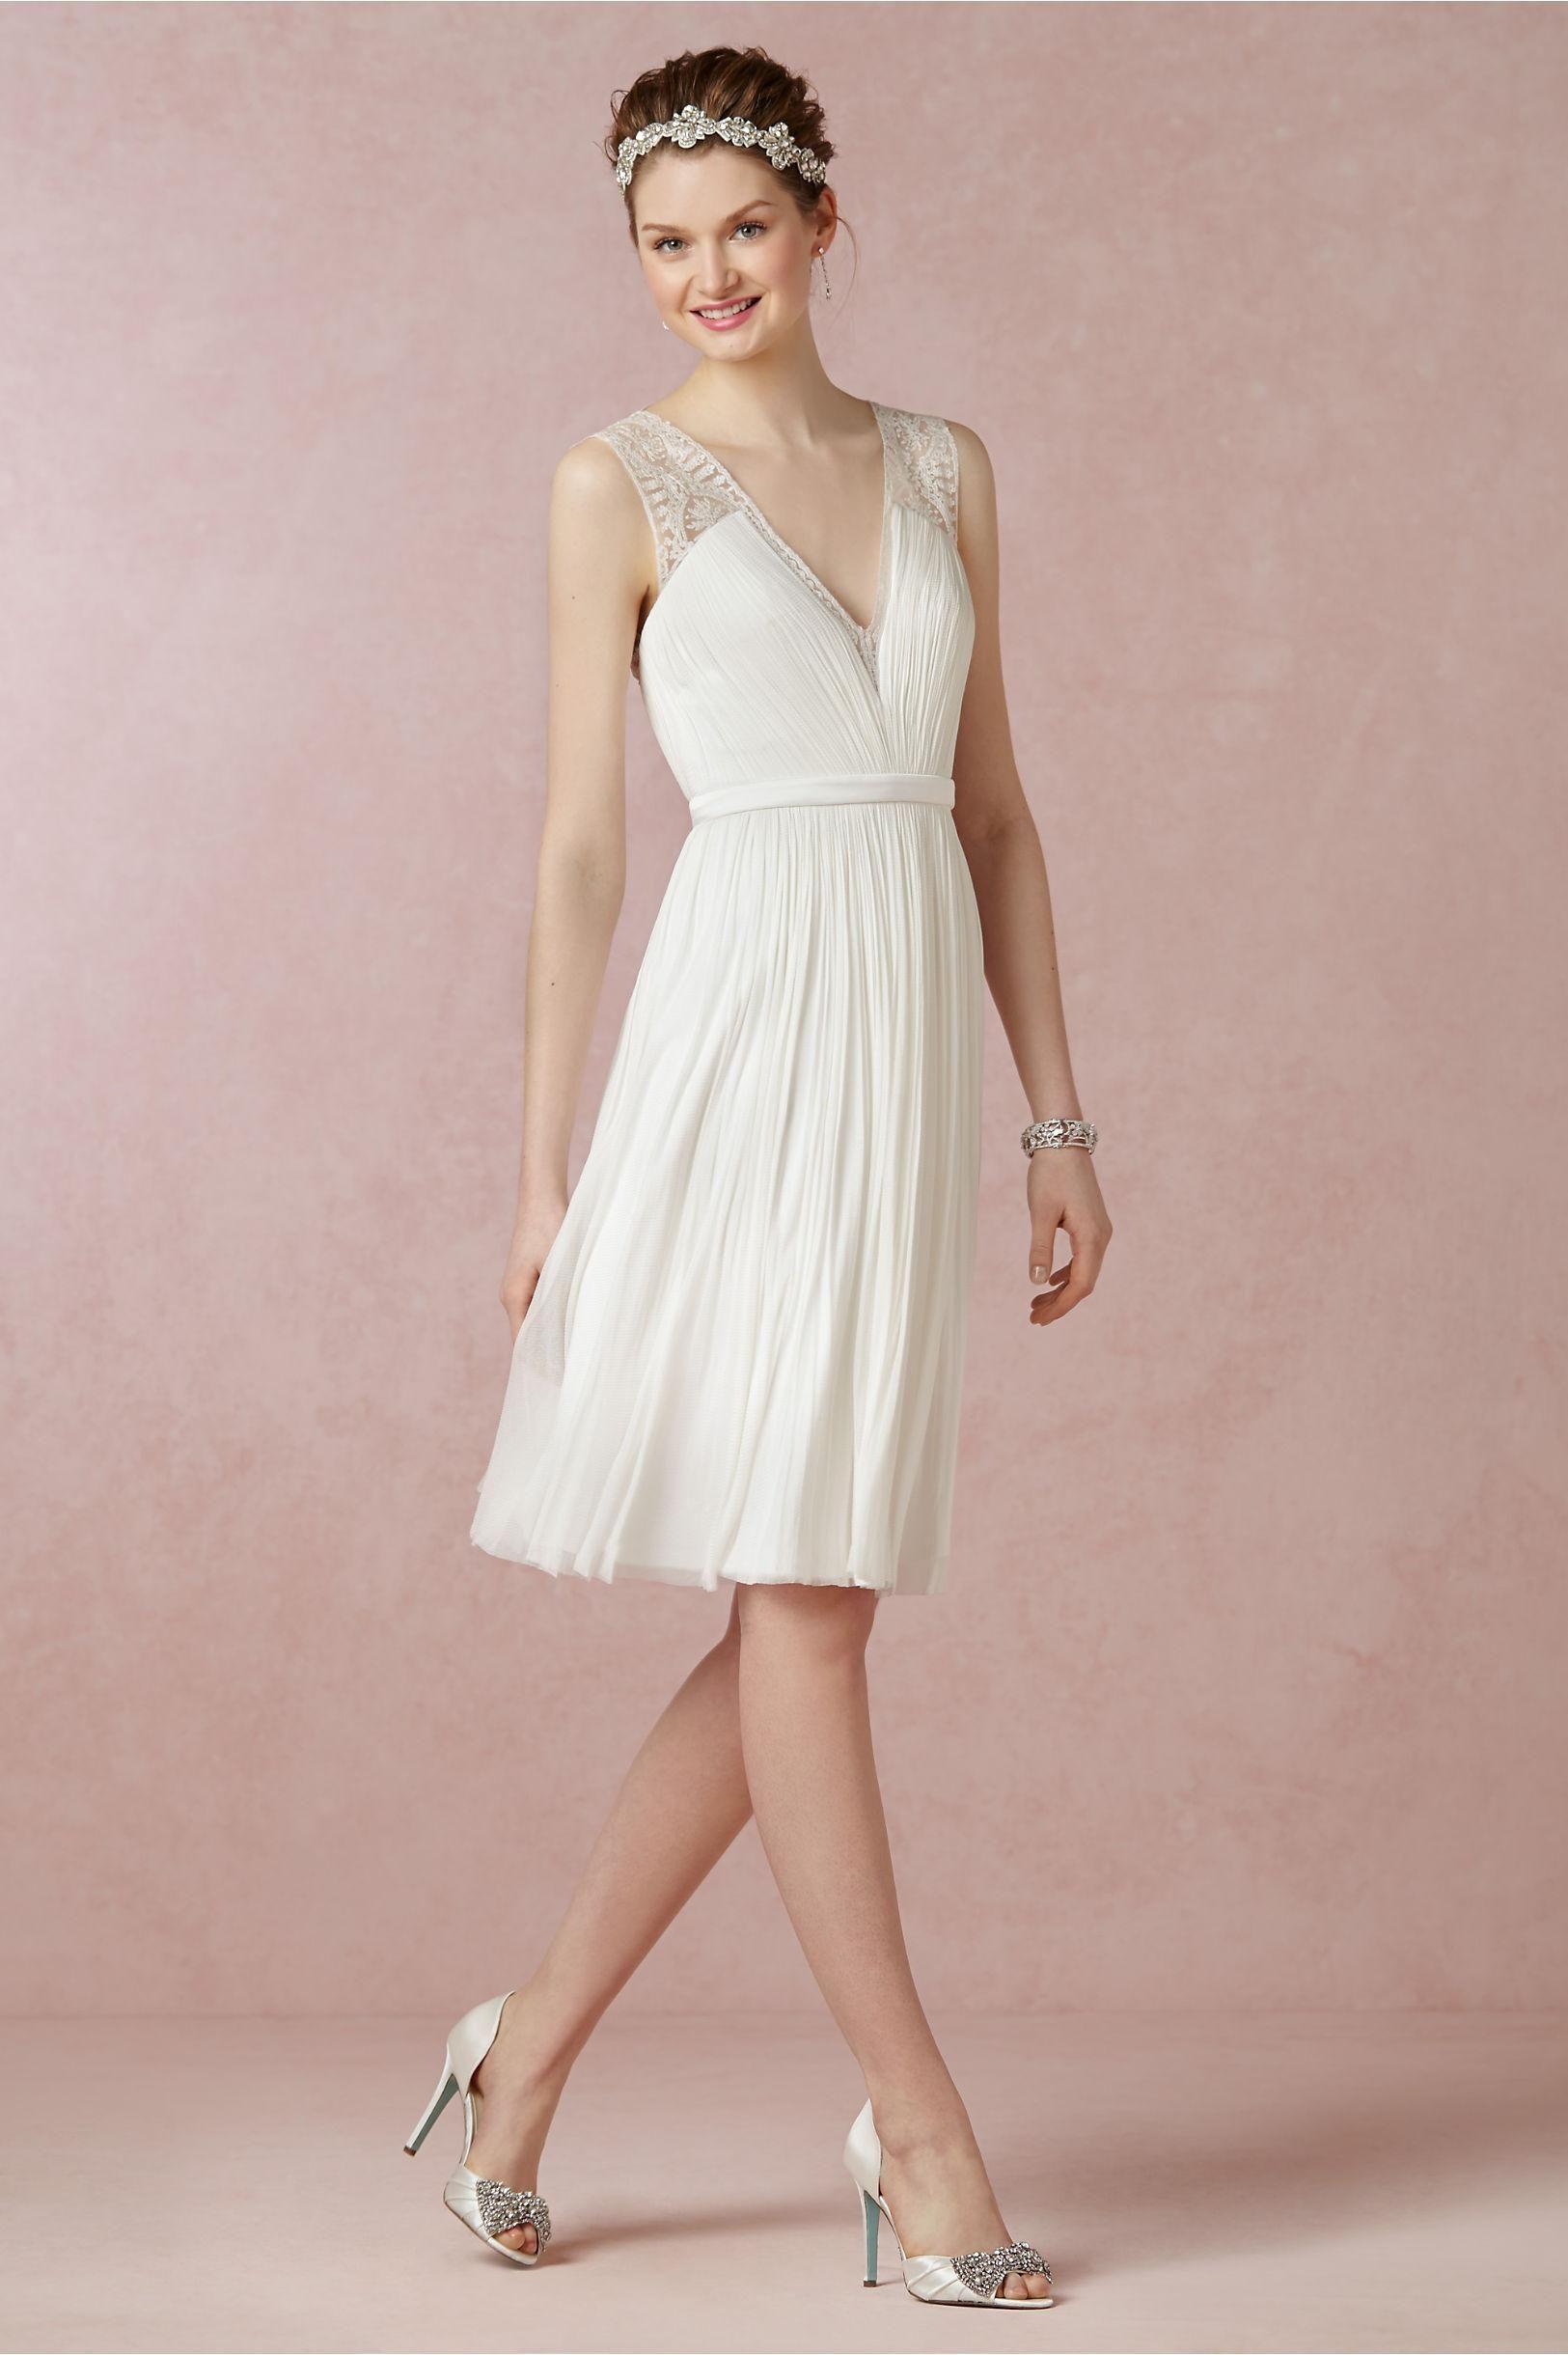 Valley Dress from BHLDN | The Modern Bride | Pinterest | Vestidos de ...